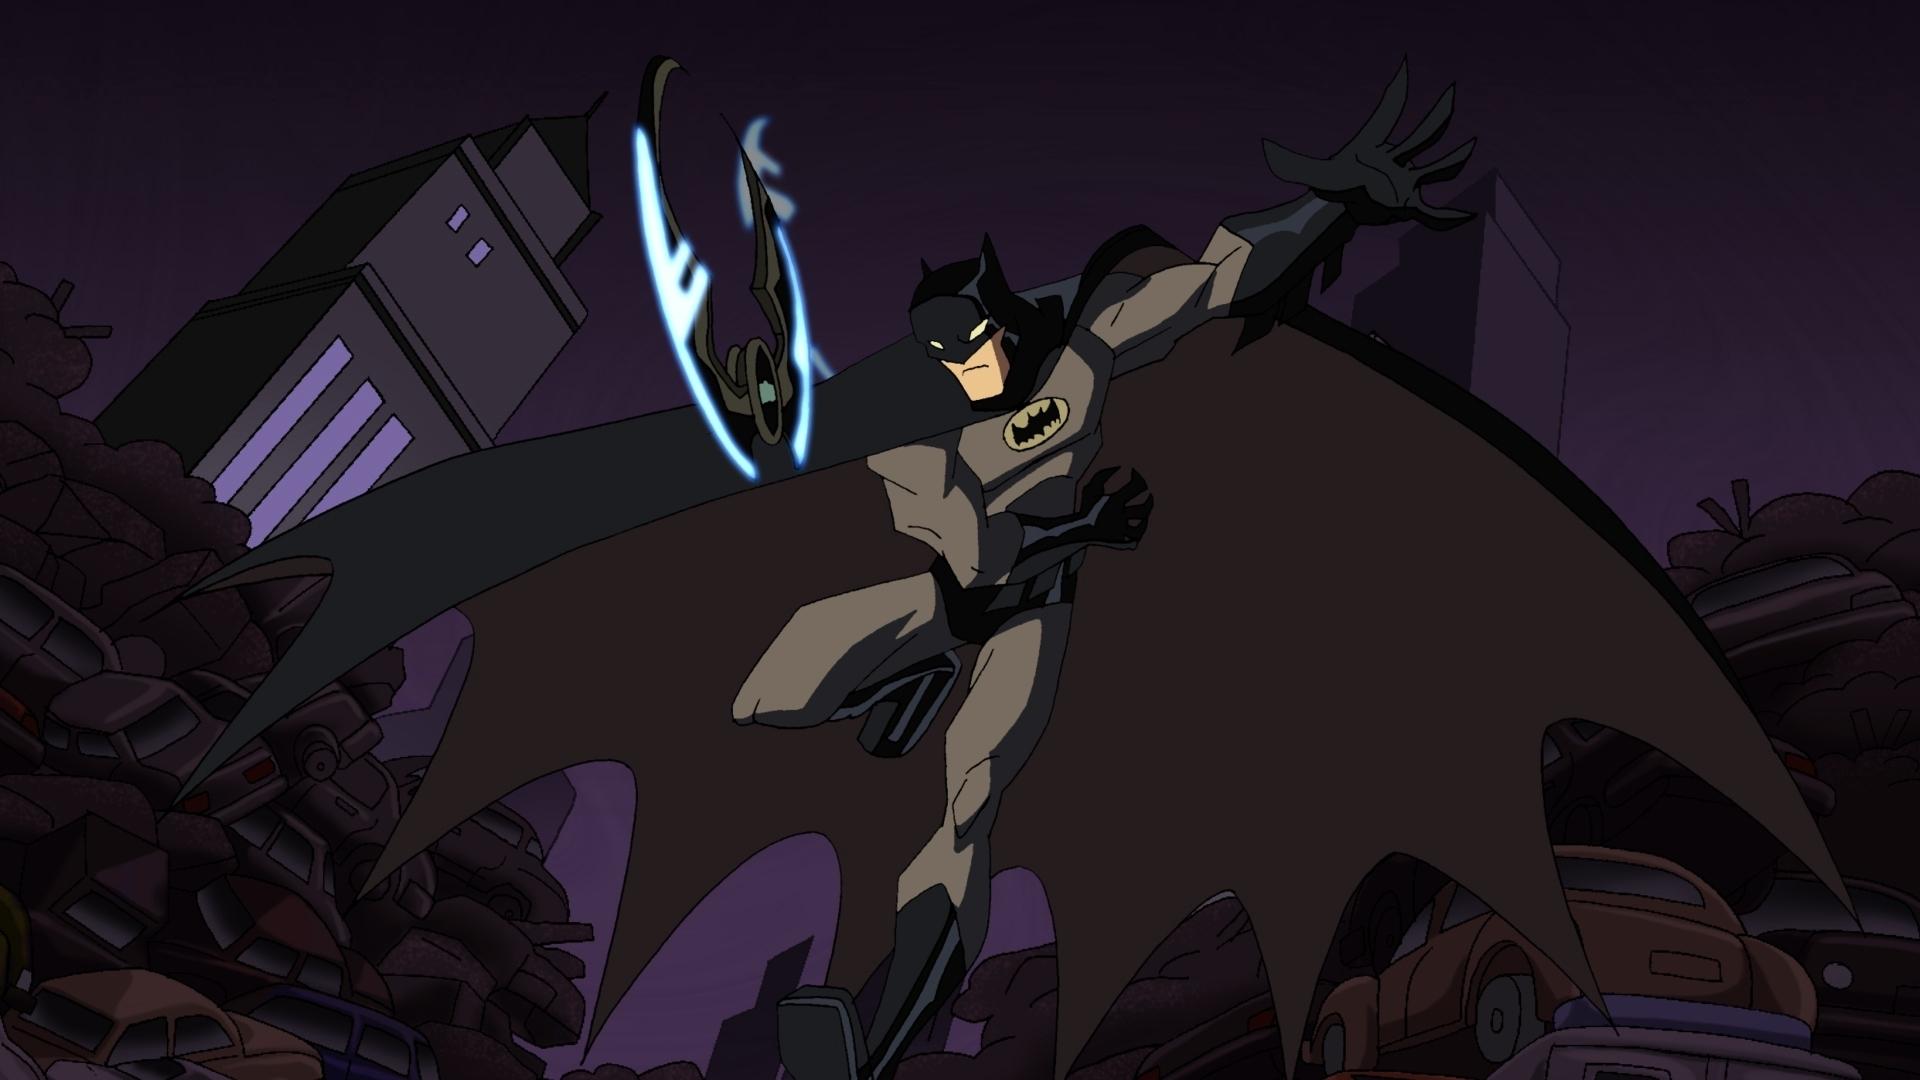 Batman Template PPT Backgrounds